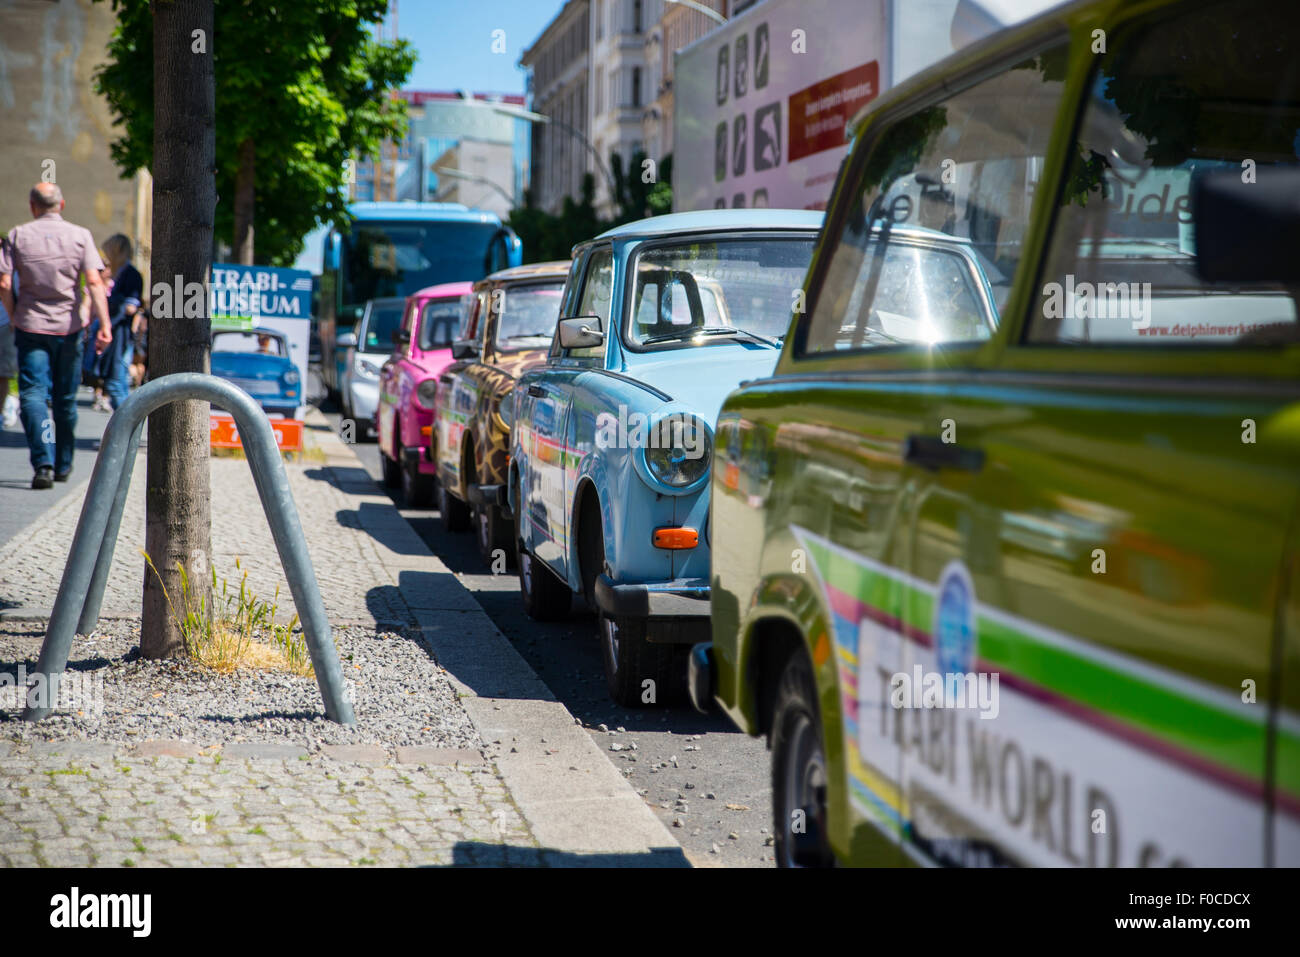 Trabi car tours, Berlin - Stock Image